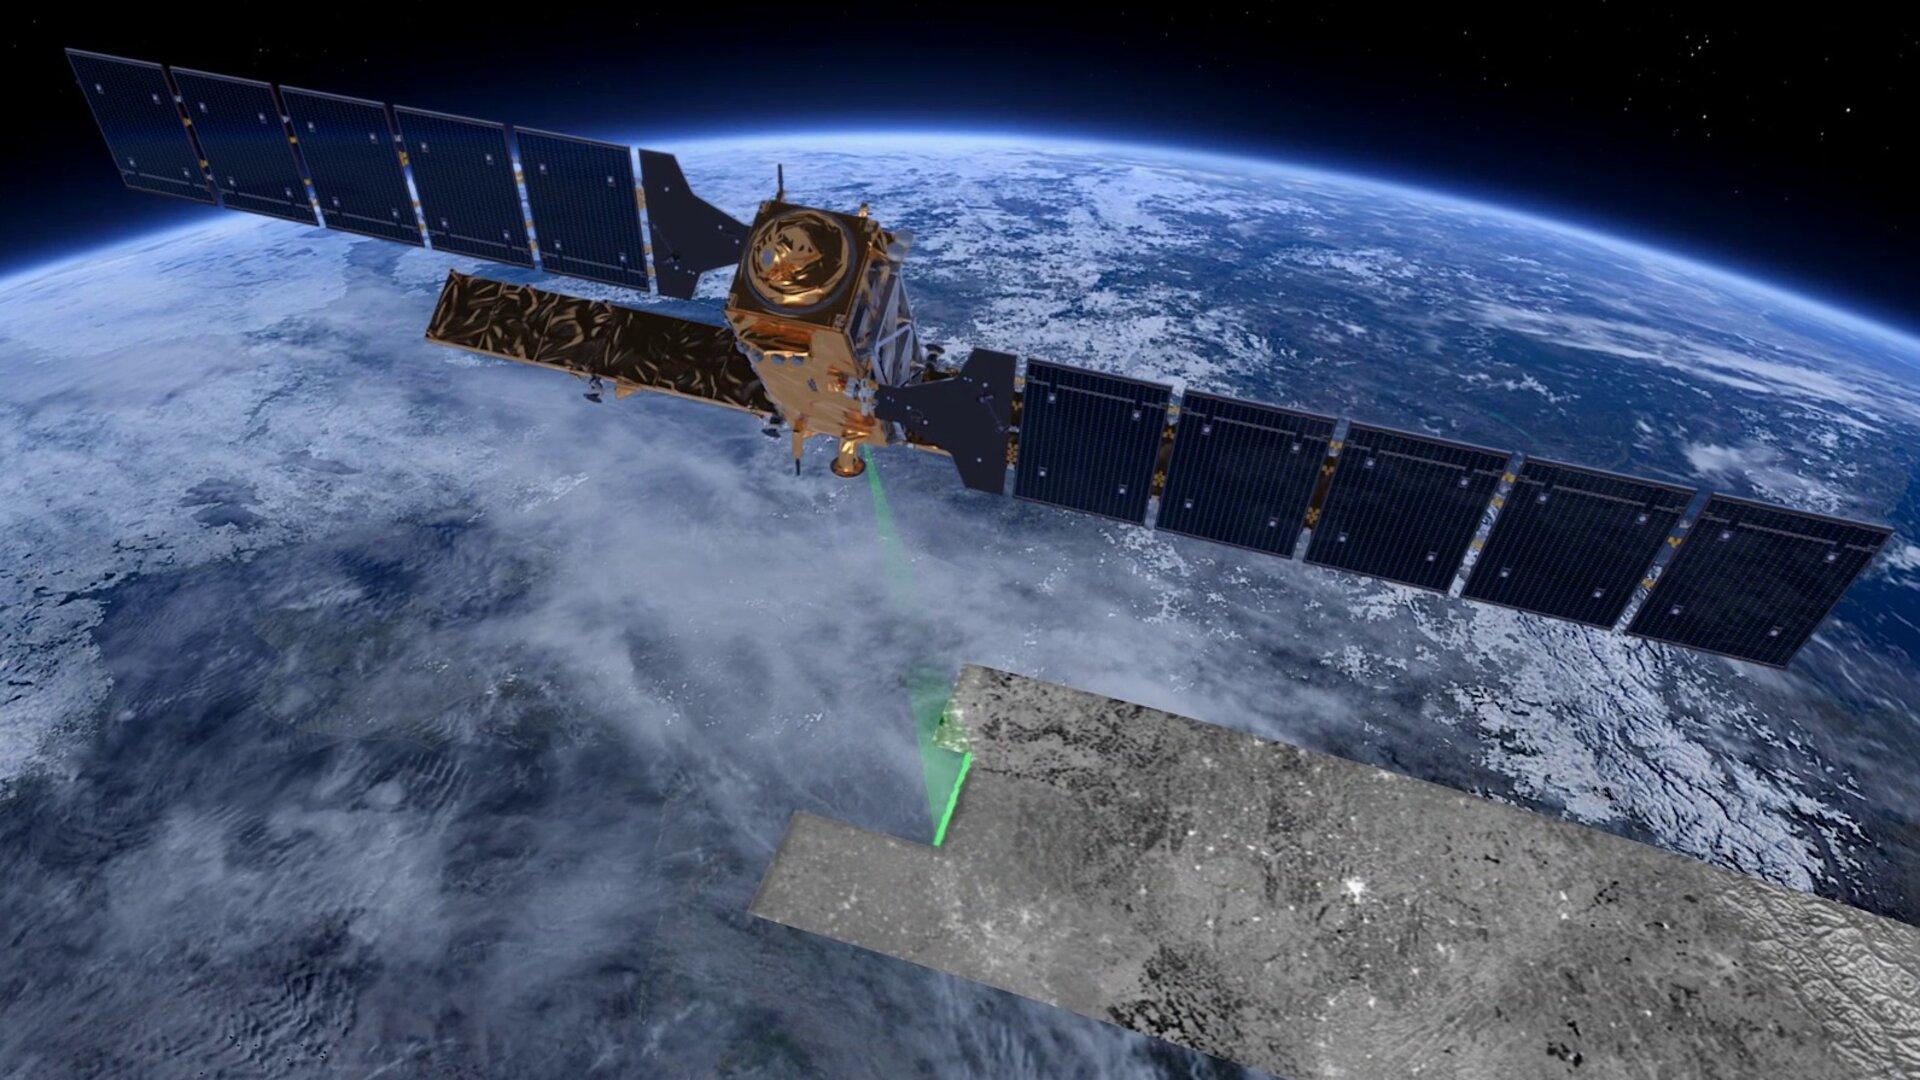 ASI - Emergenza Messico: l'aiuto dei dati satellitari